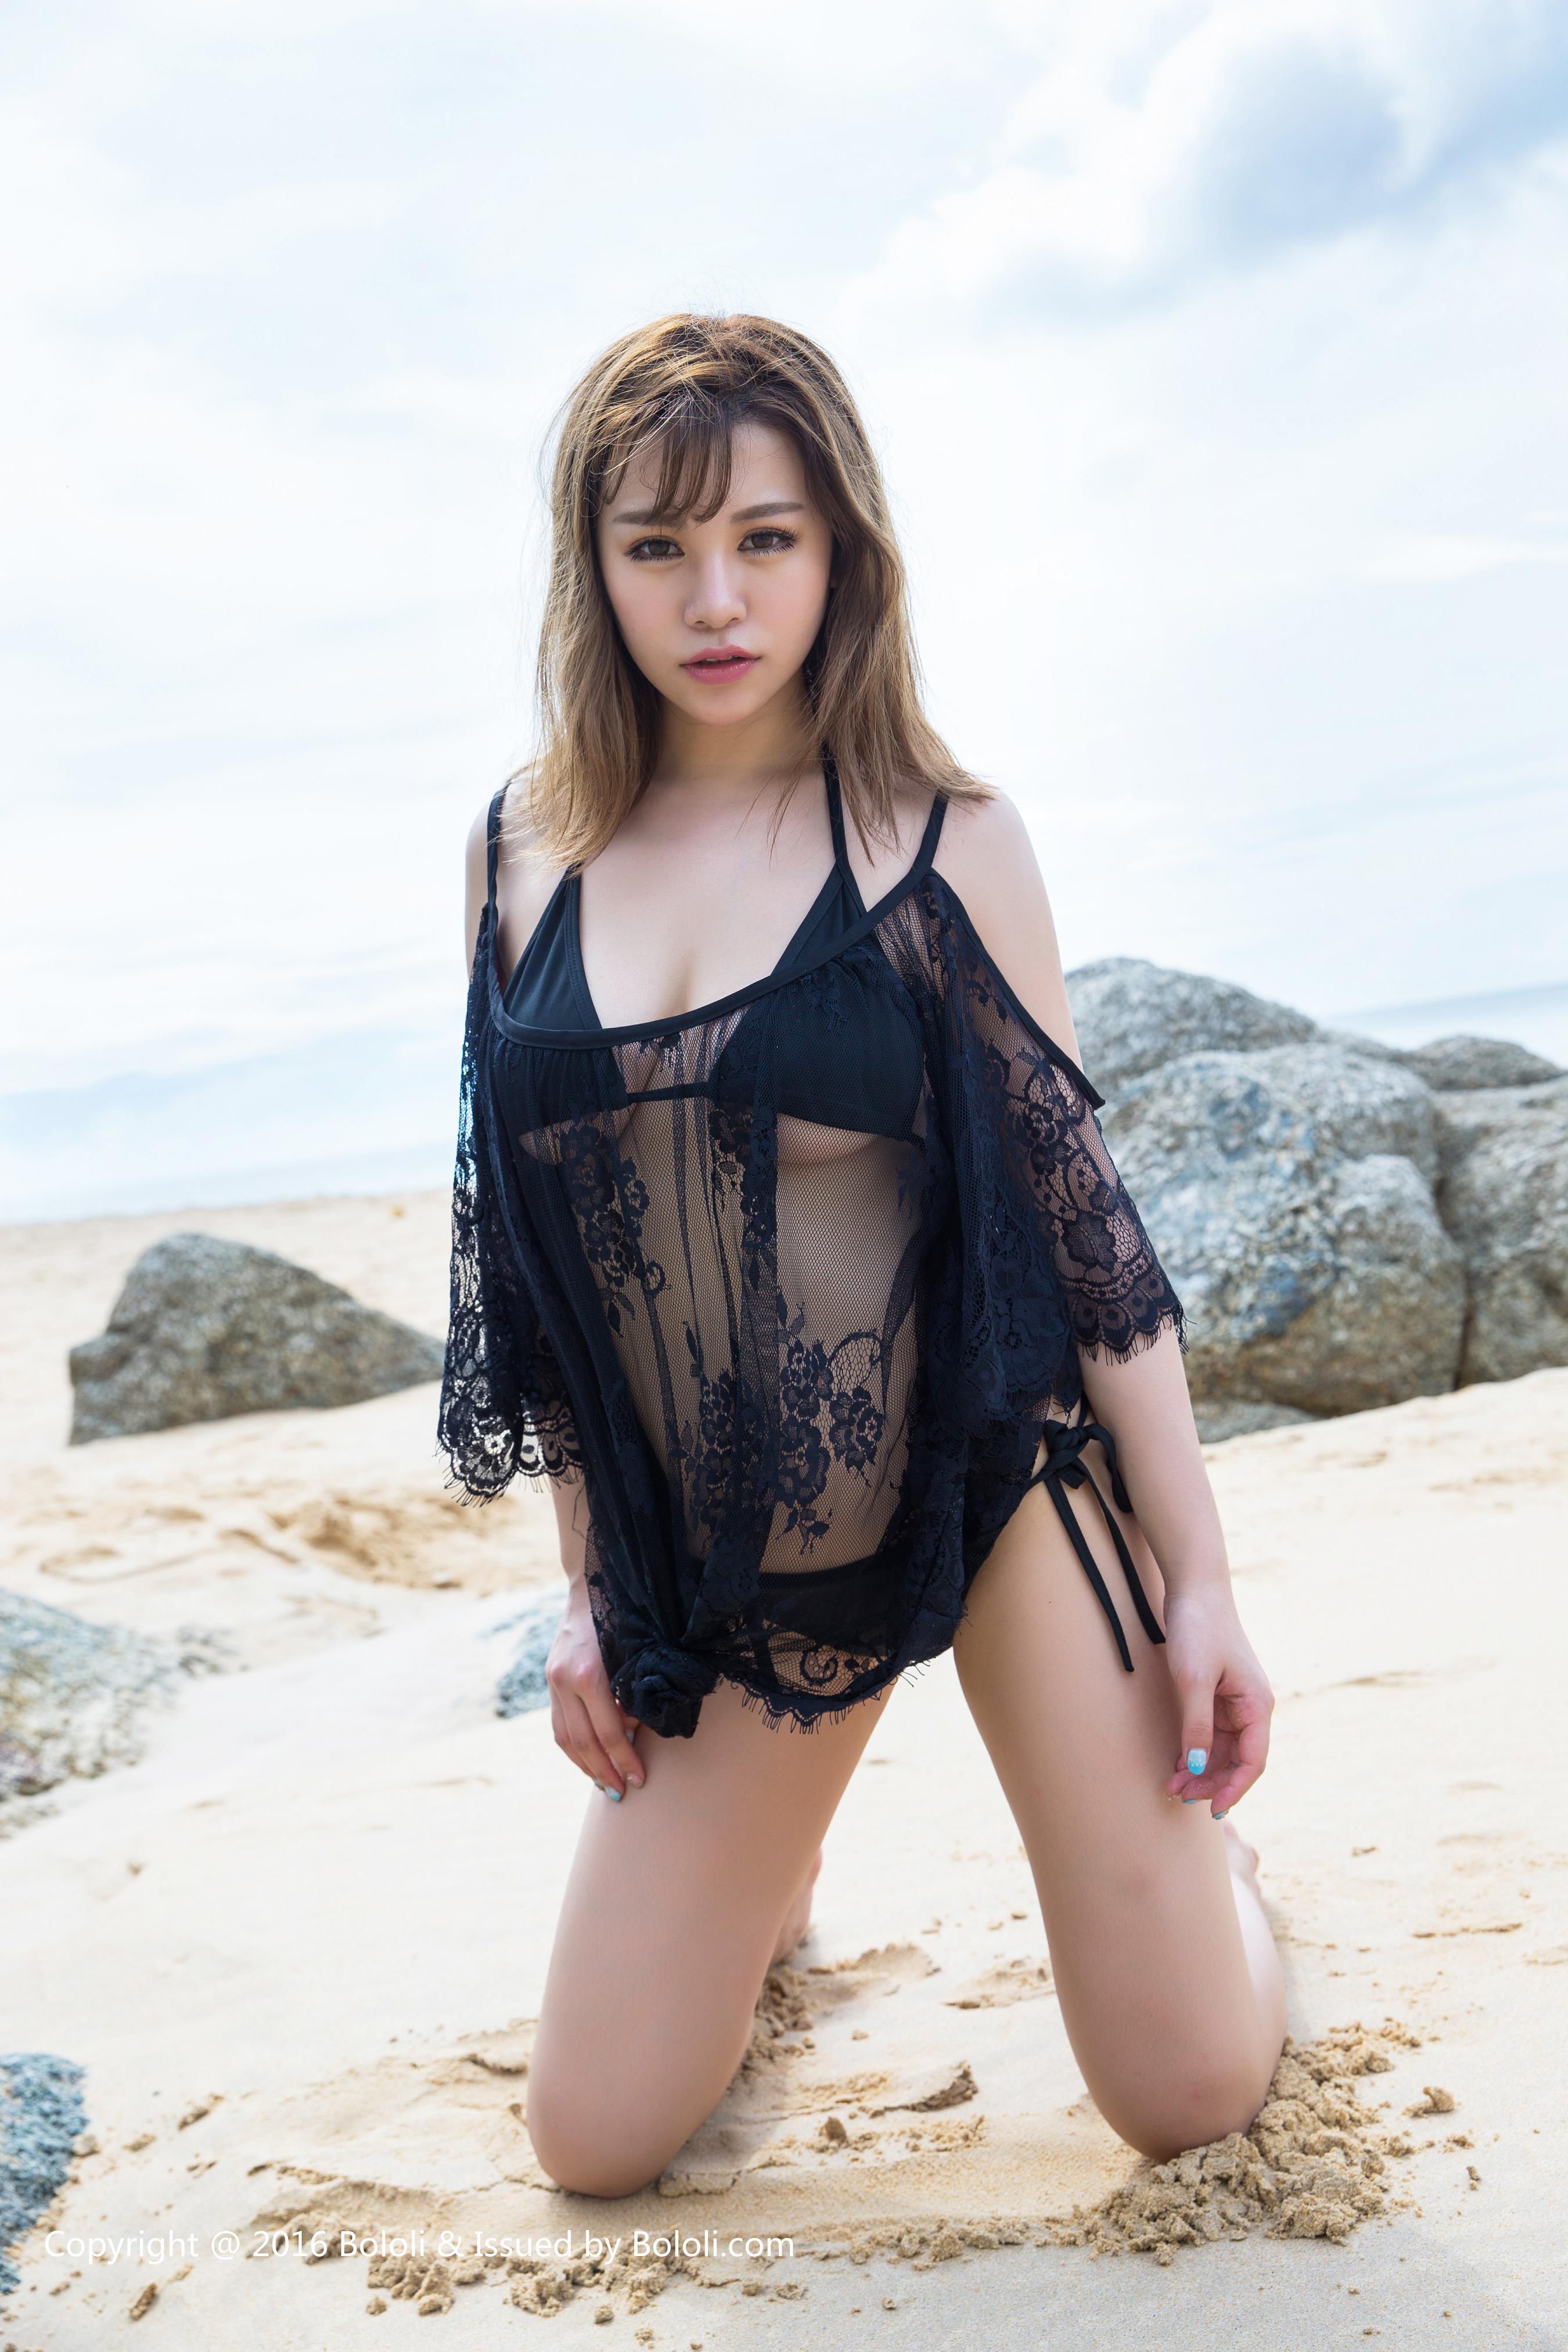 [BoLoli波萝社]BOL019 童颜巨乳 刘娅希 性感透视情趣内衣与比基尼泳装 泰国清凉写真